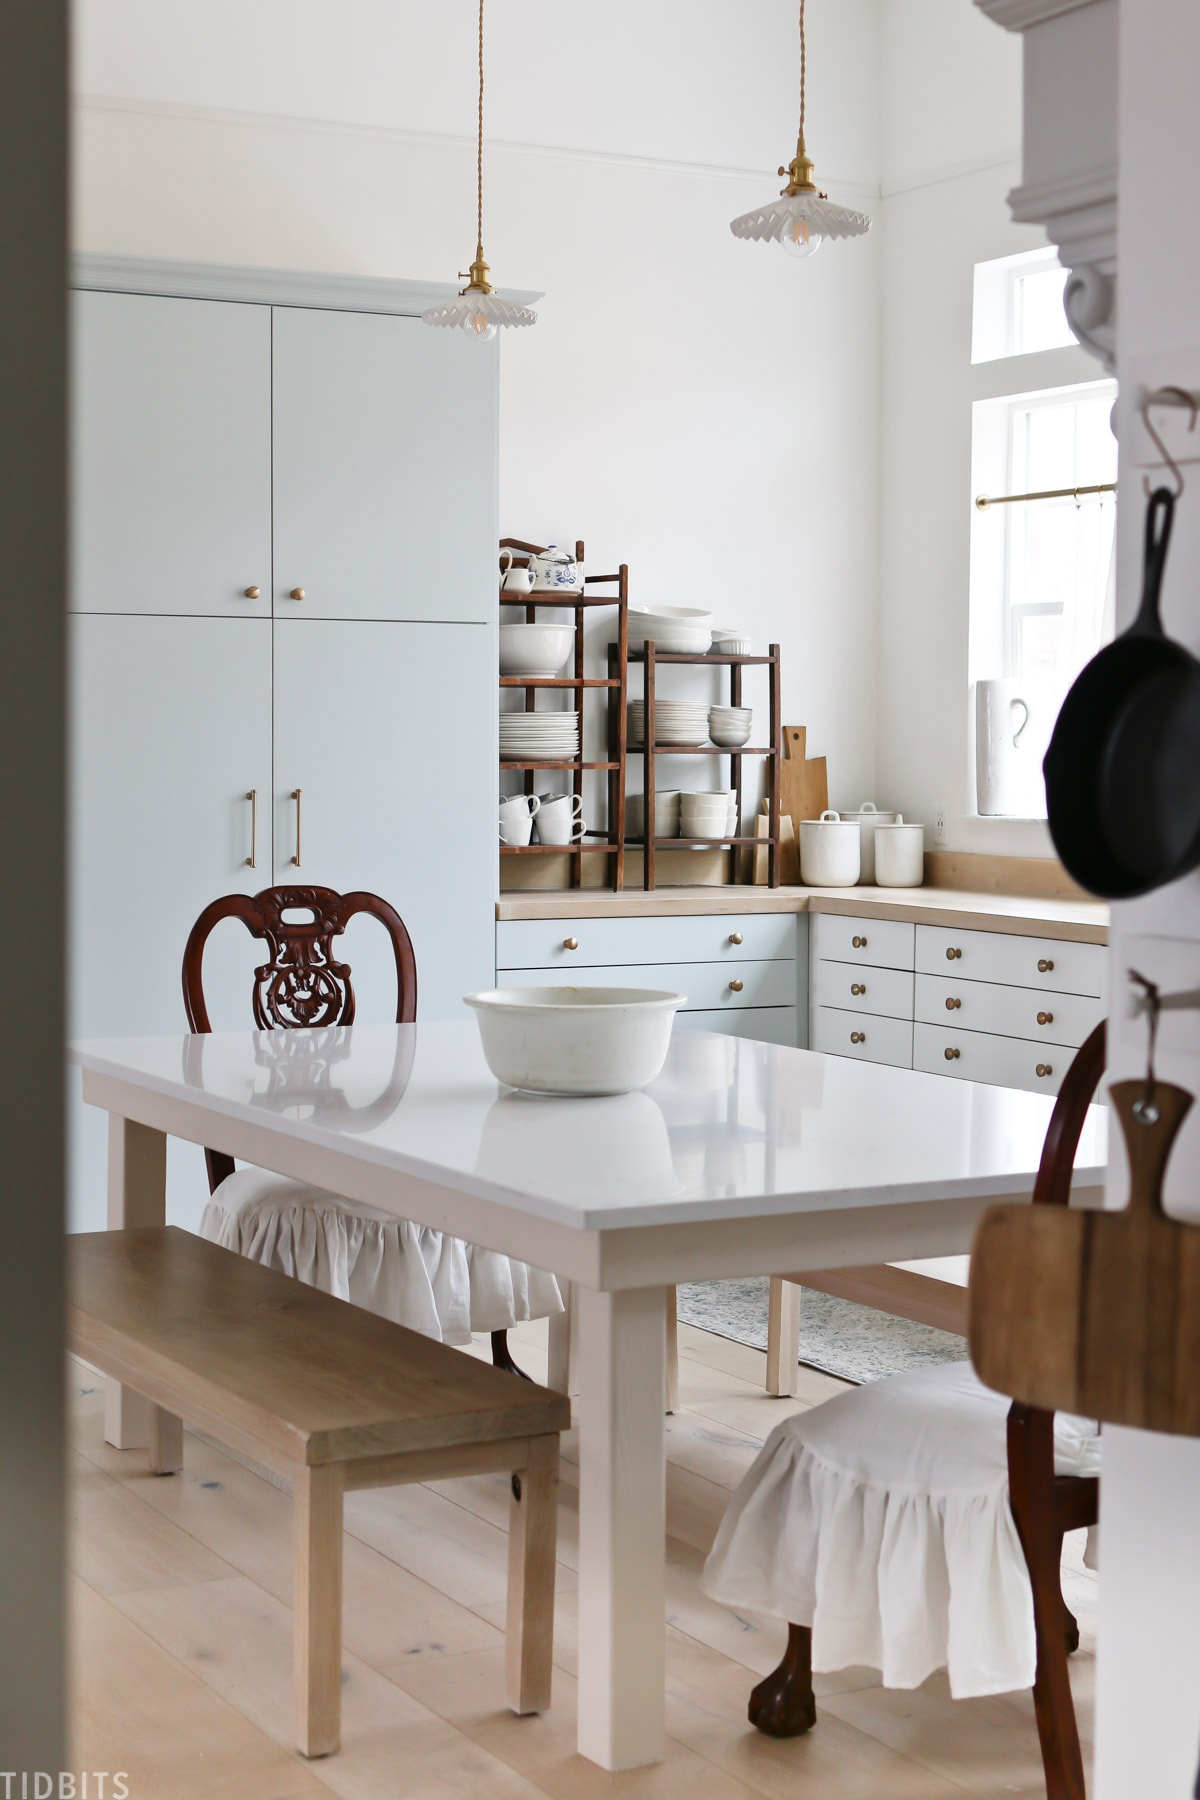 A European kitchen with subtle blue cabinetry and antique décor.